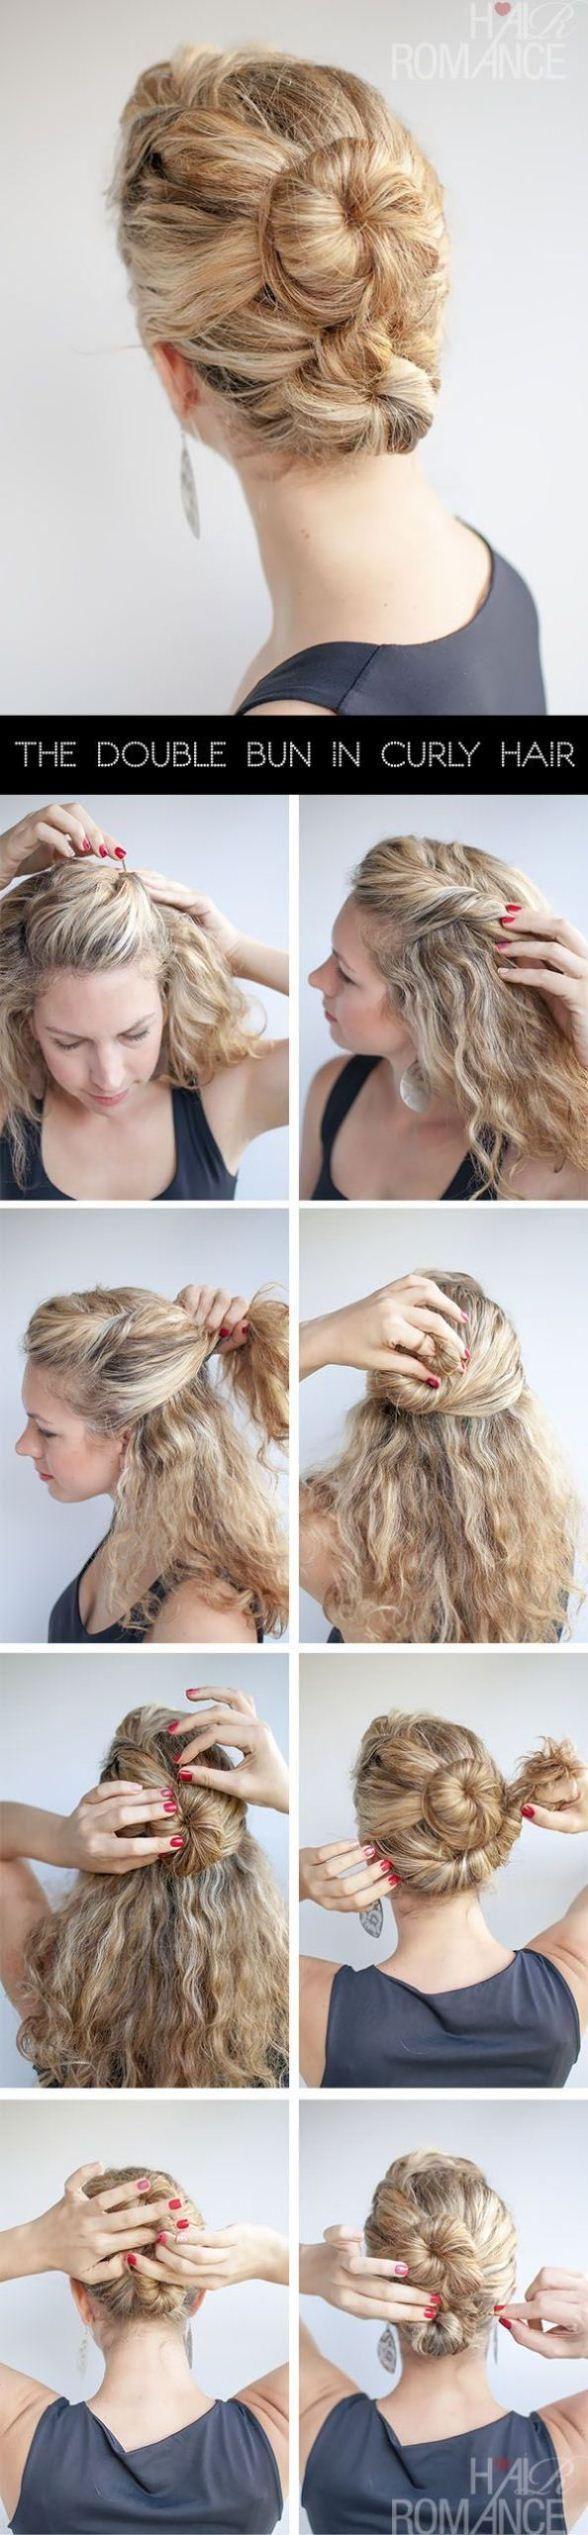 DIY Wedding Hair : DIY The Double Bun in curly hair